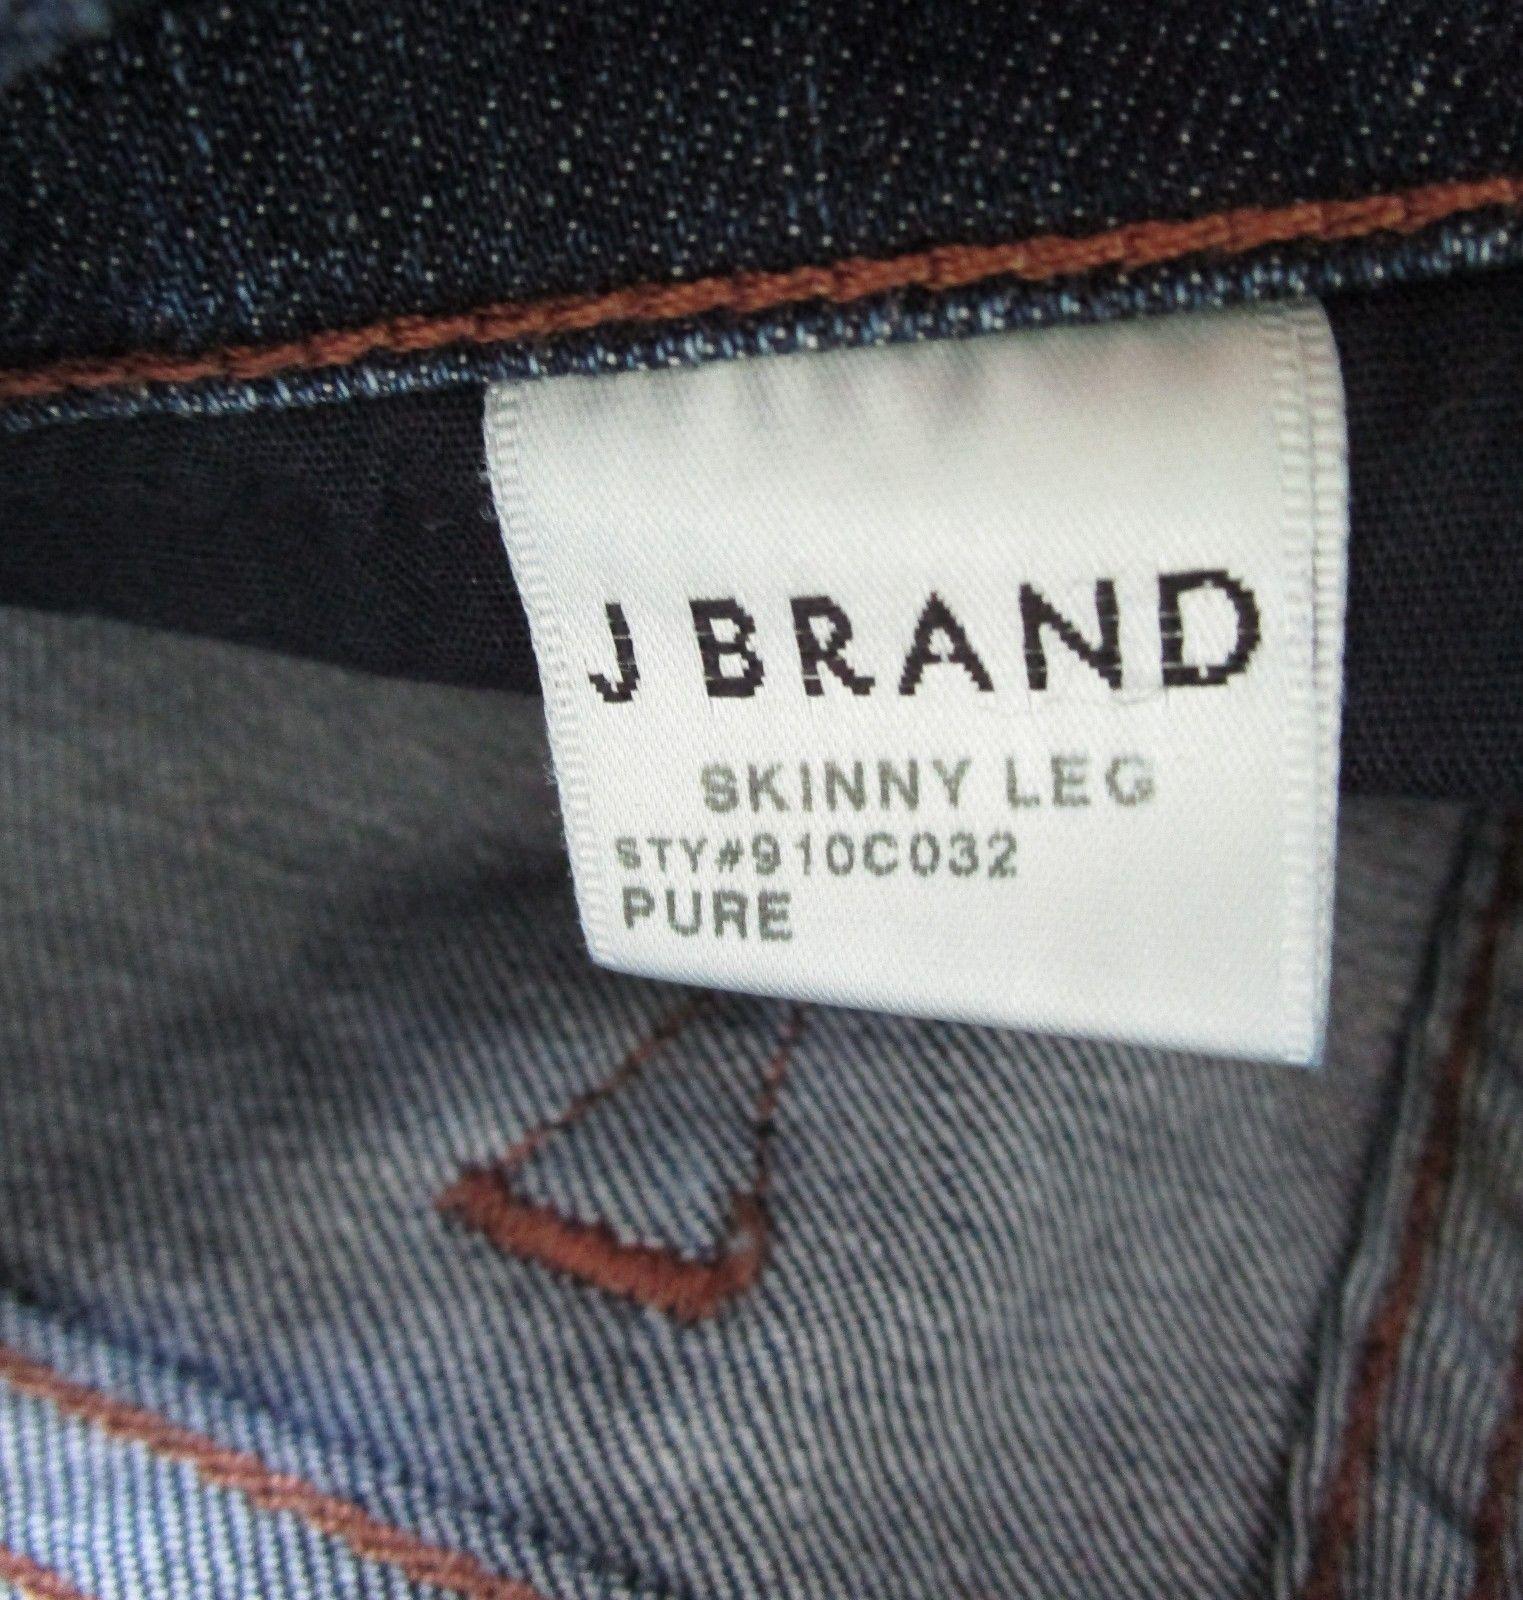 "J BRAND Women's Dark Denim Skinny Leg ""Pure"" 5 Pocket Jean Size 27 image 5"